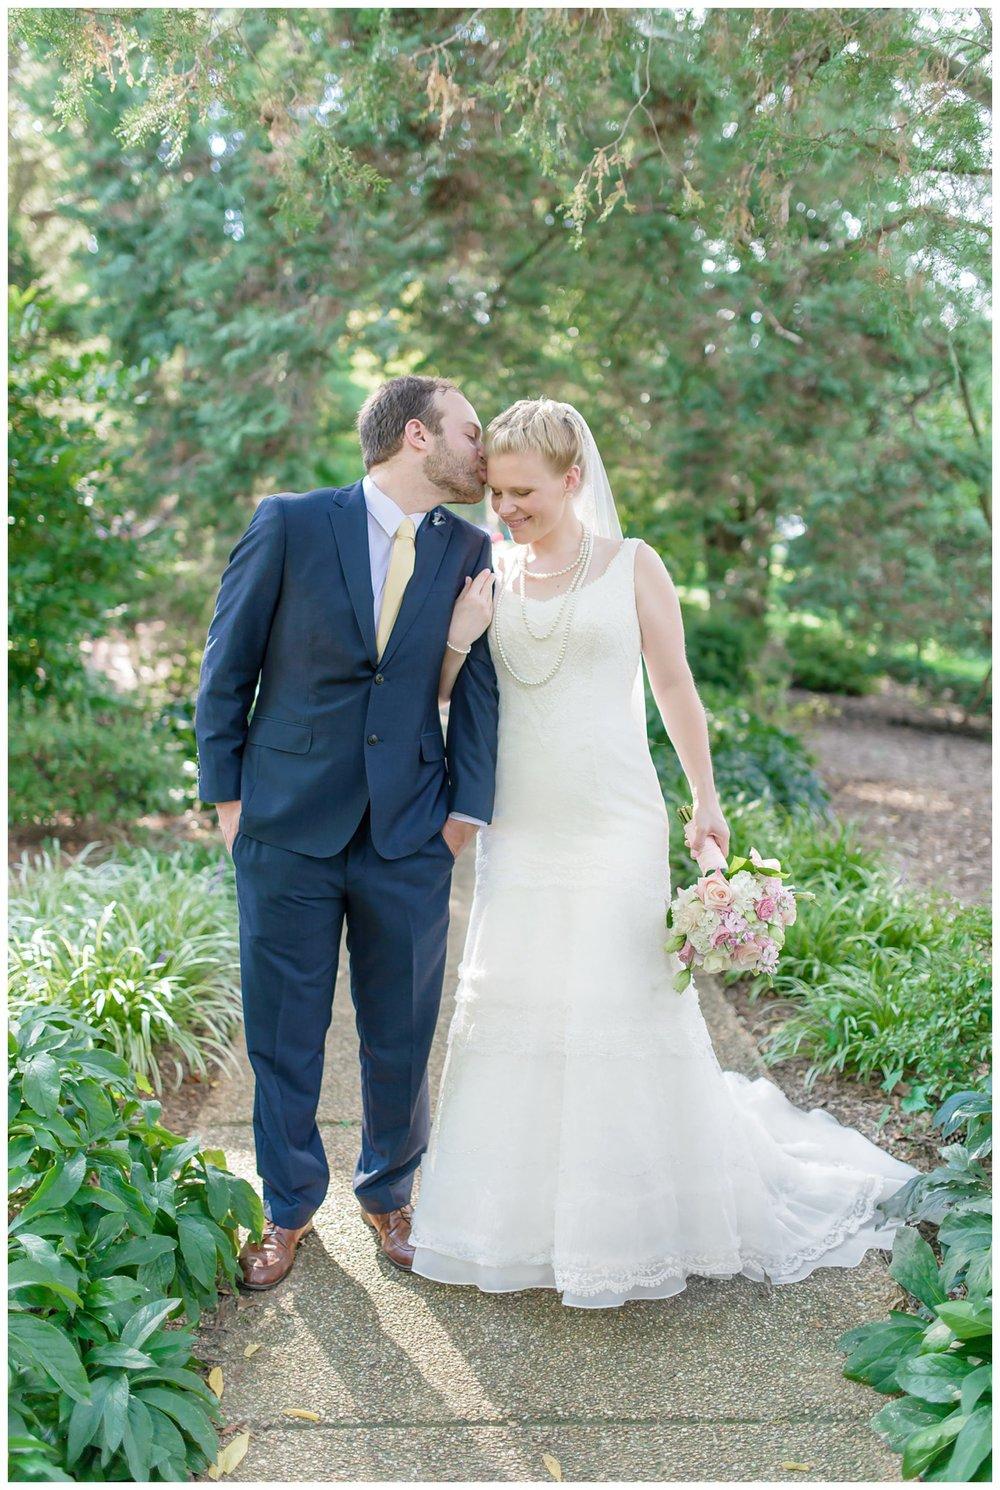 Della and Andrew Wedding Photos_Hendry House Arlington Virginia_Stephanie Kopf Photography_Northern Virginia Wedding Photography-75.jpg